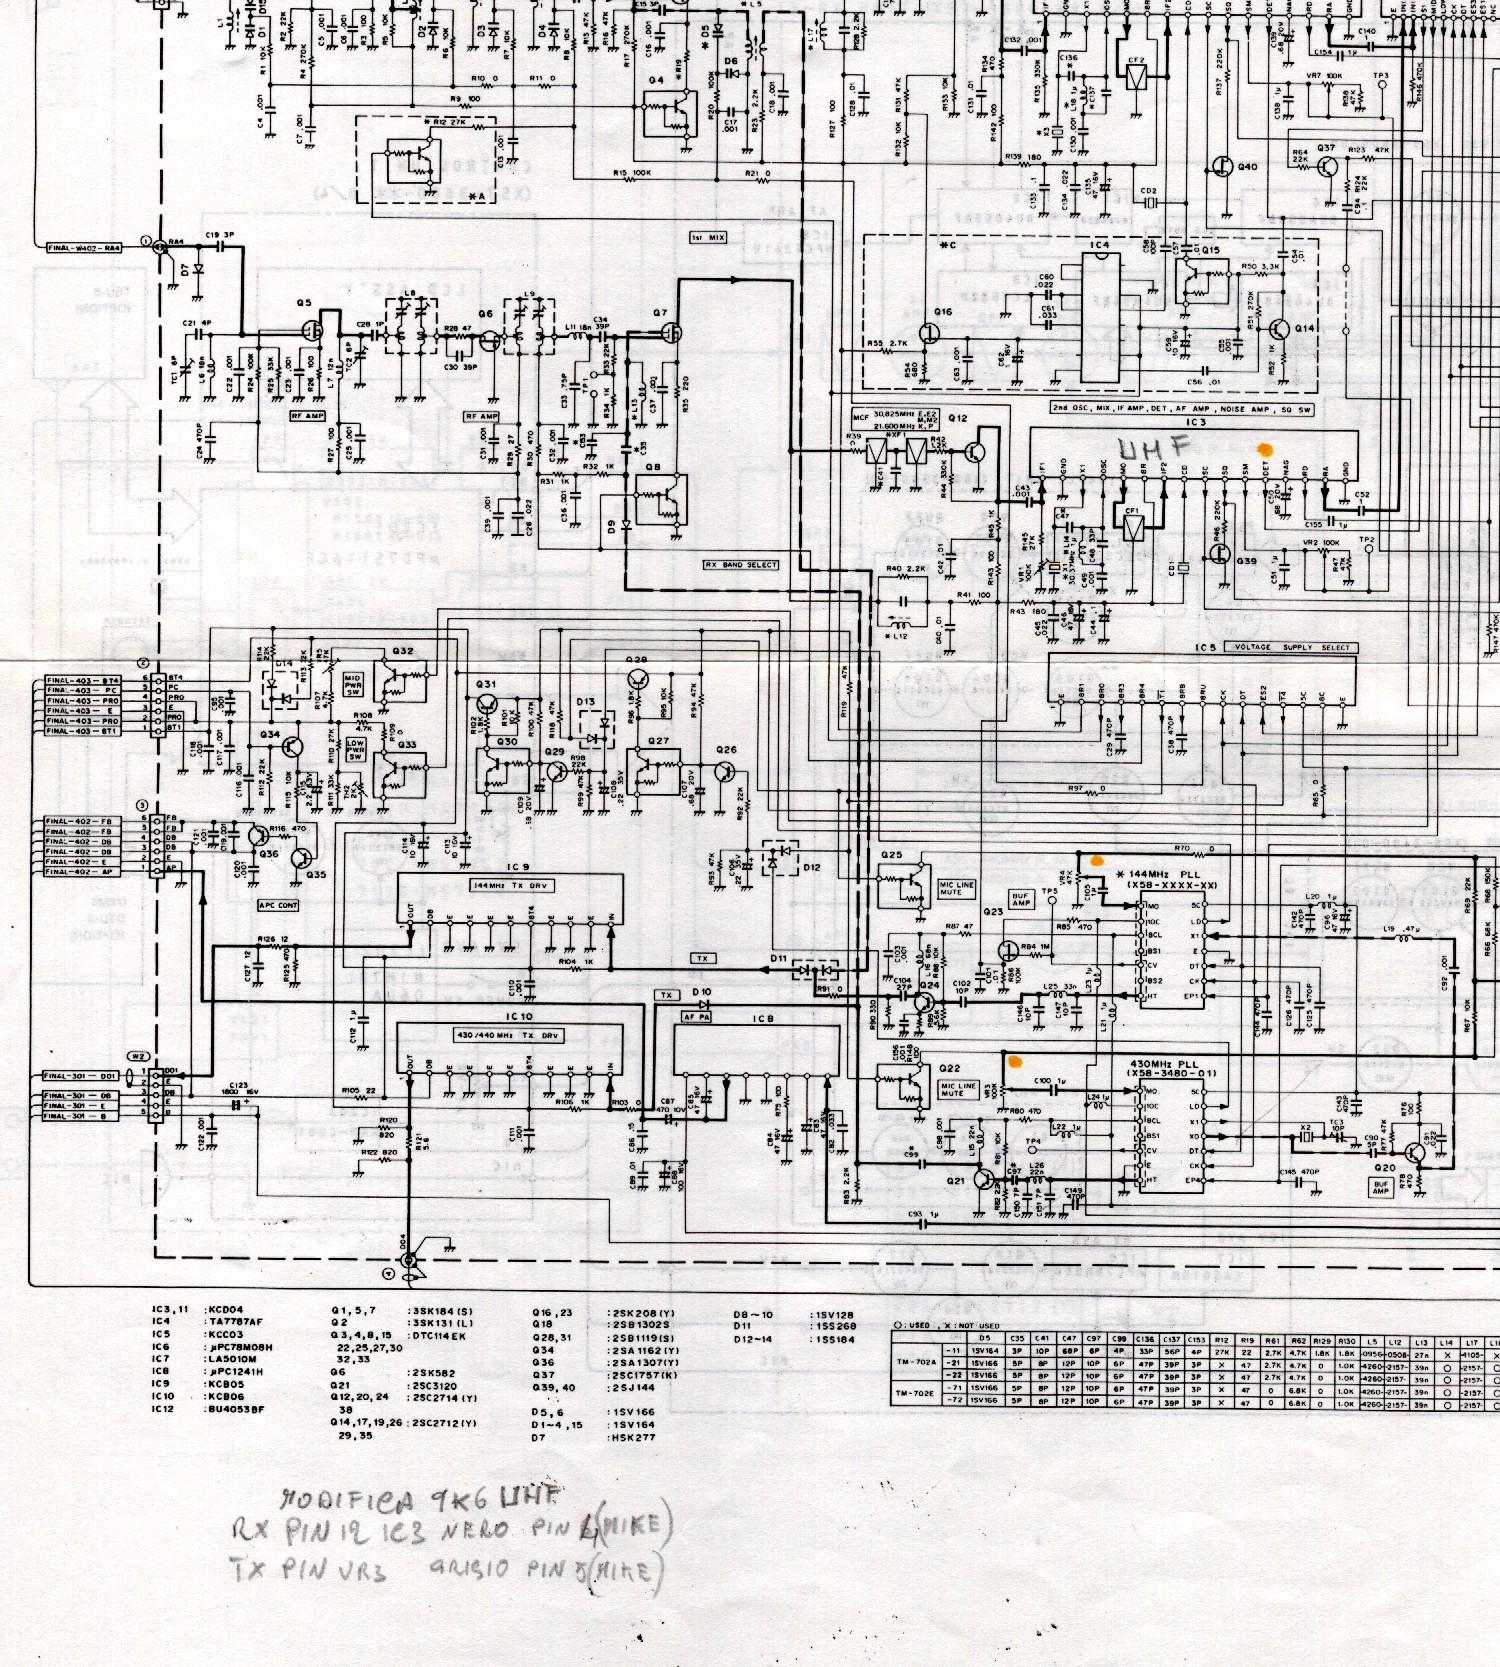 KENWOOD TM 702 Schema1?quality=80&strip=all midland mic wiring diagram wiring library